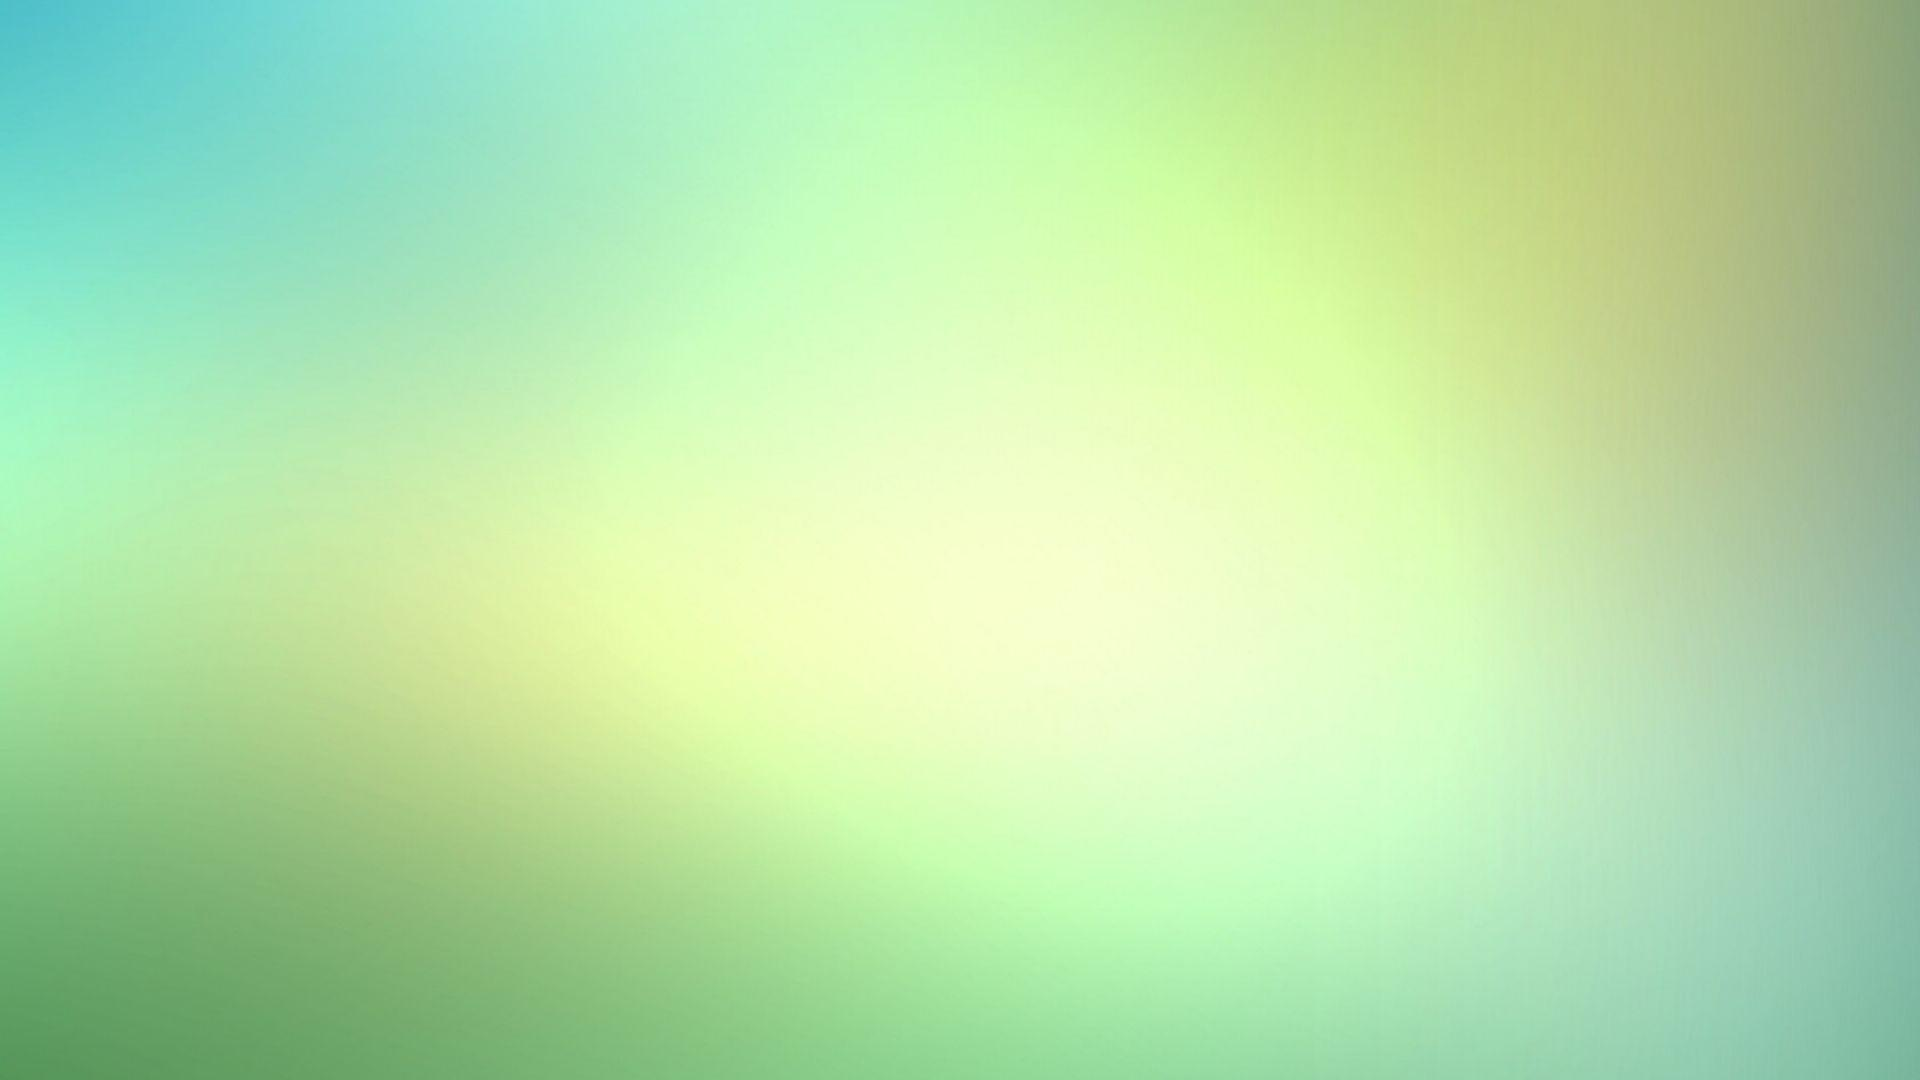 Sage Green Wallpapers Desktop - Wallpaper Cave